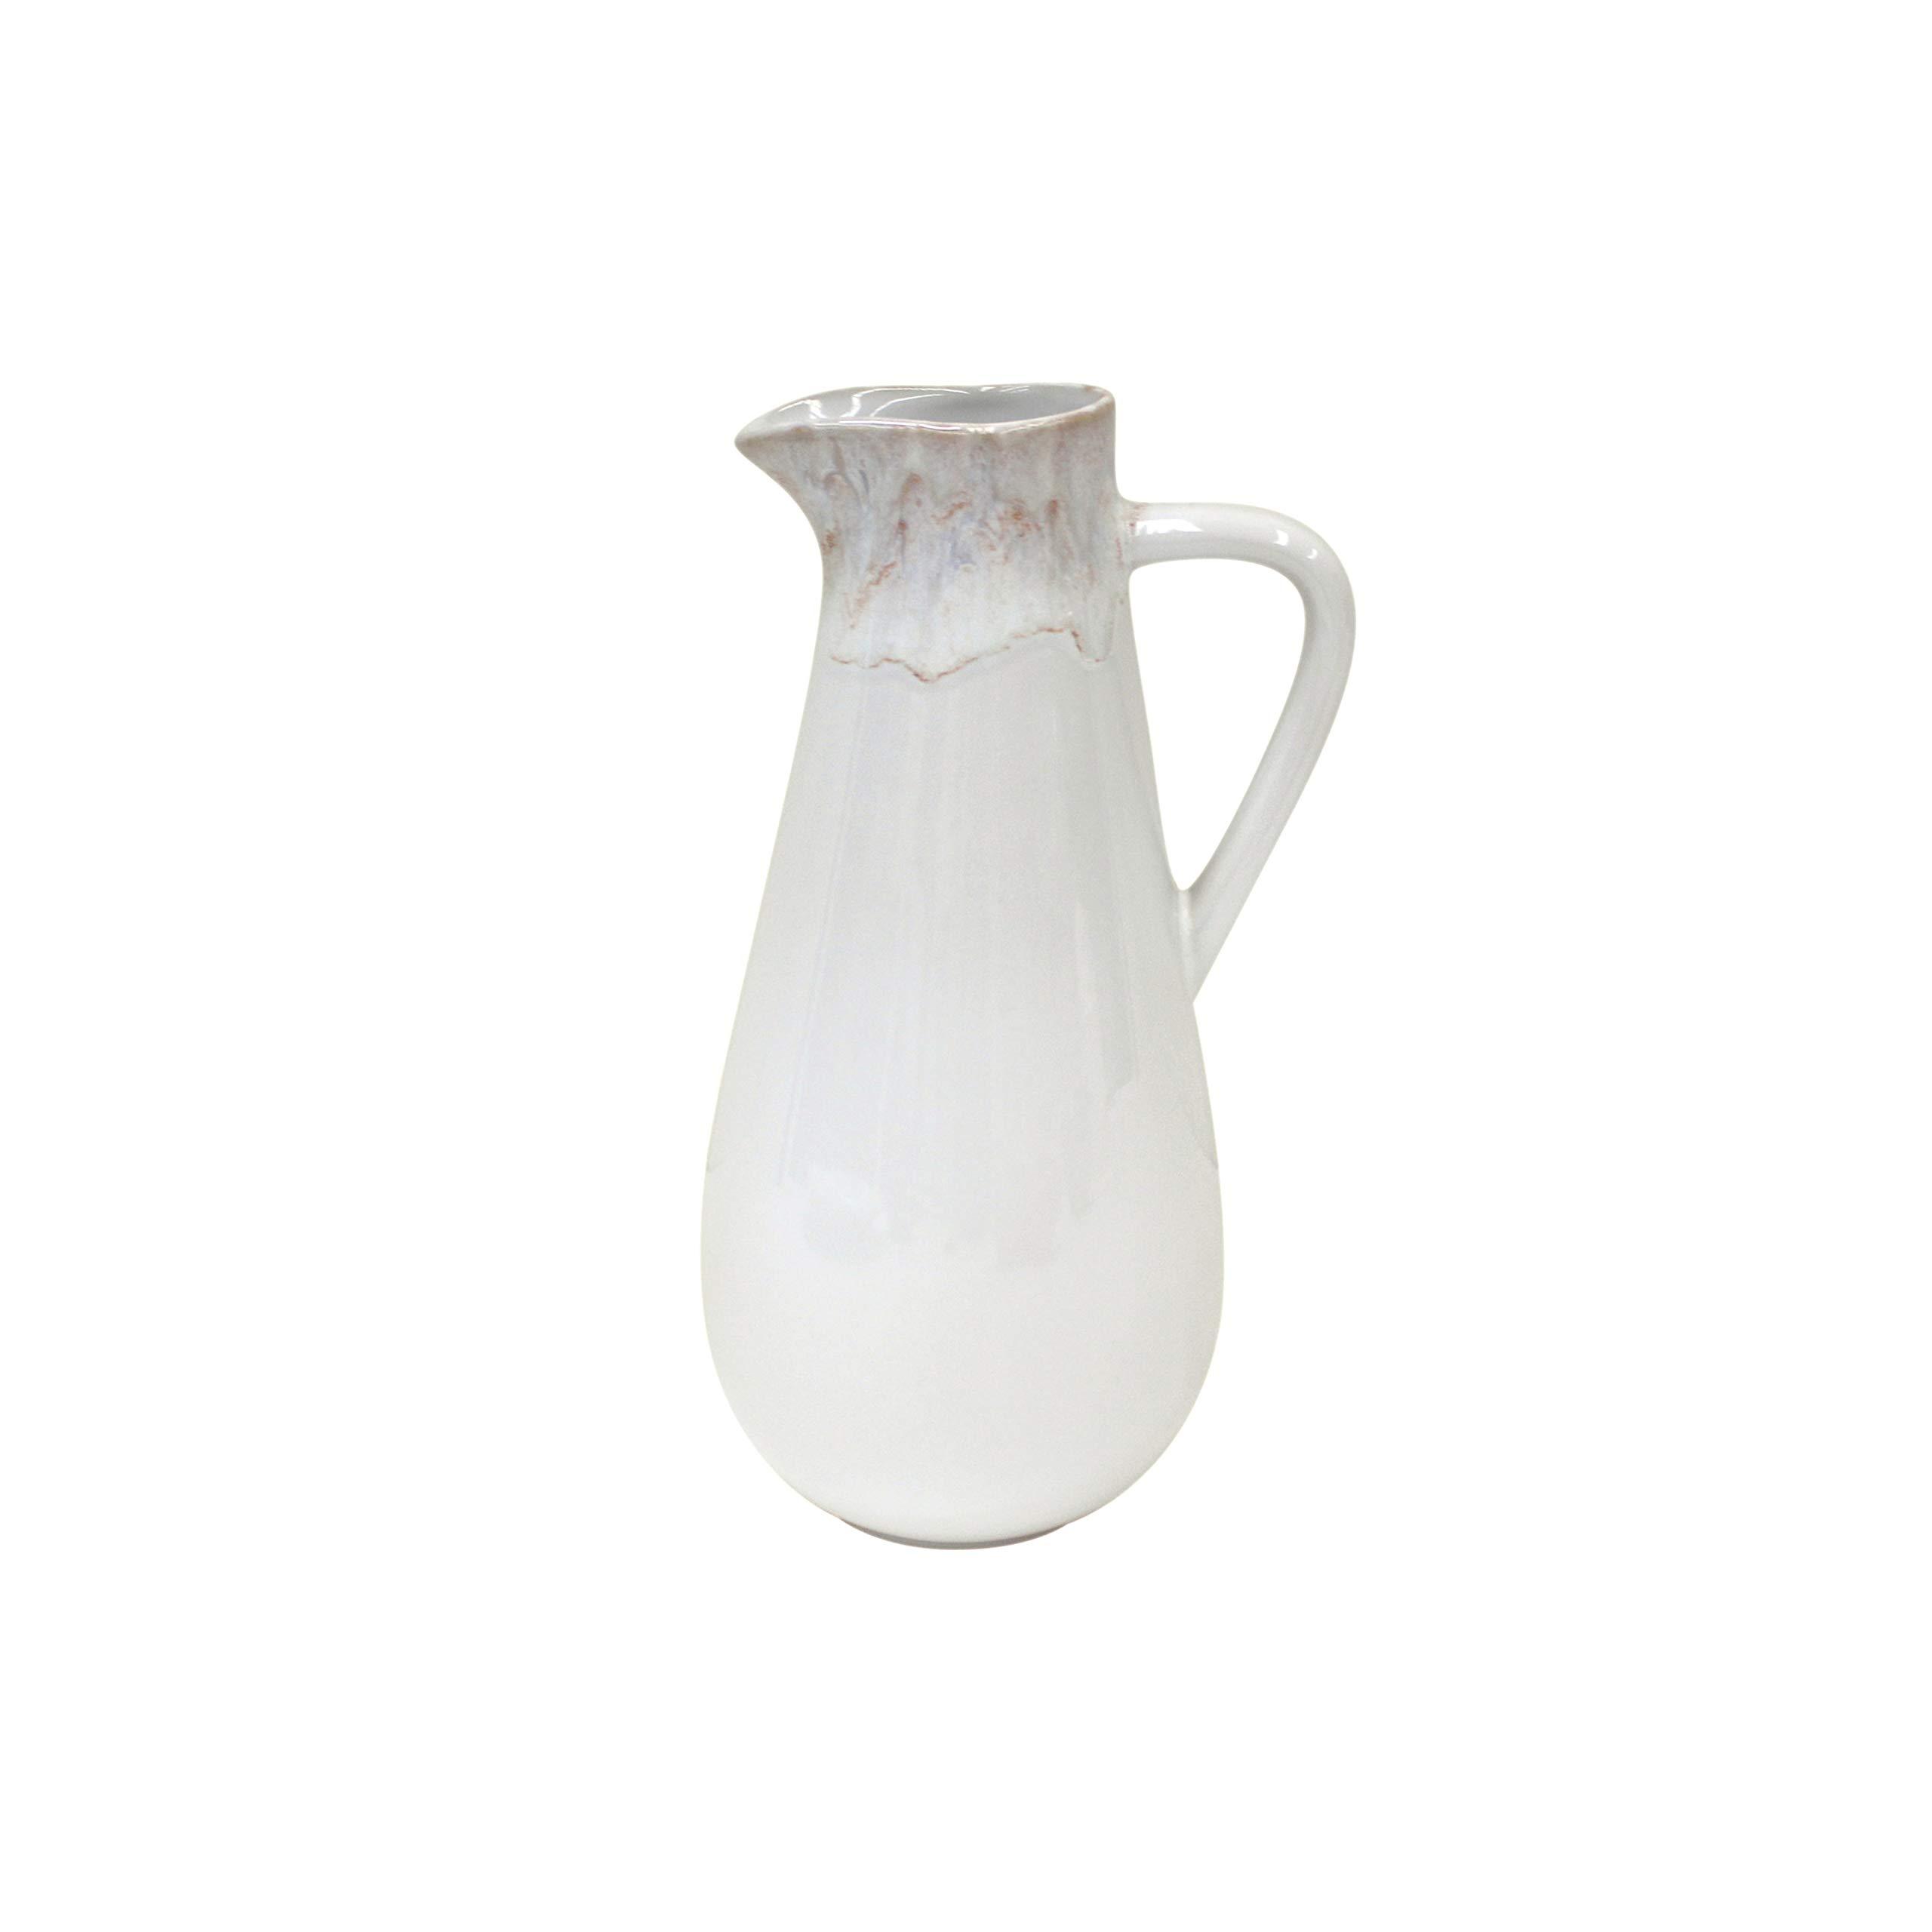 Casafina Taormina Collection Stoneware Ceramic Pitcher 56 oz, White